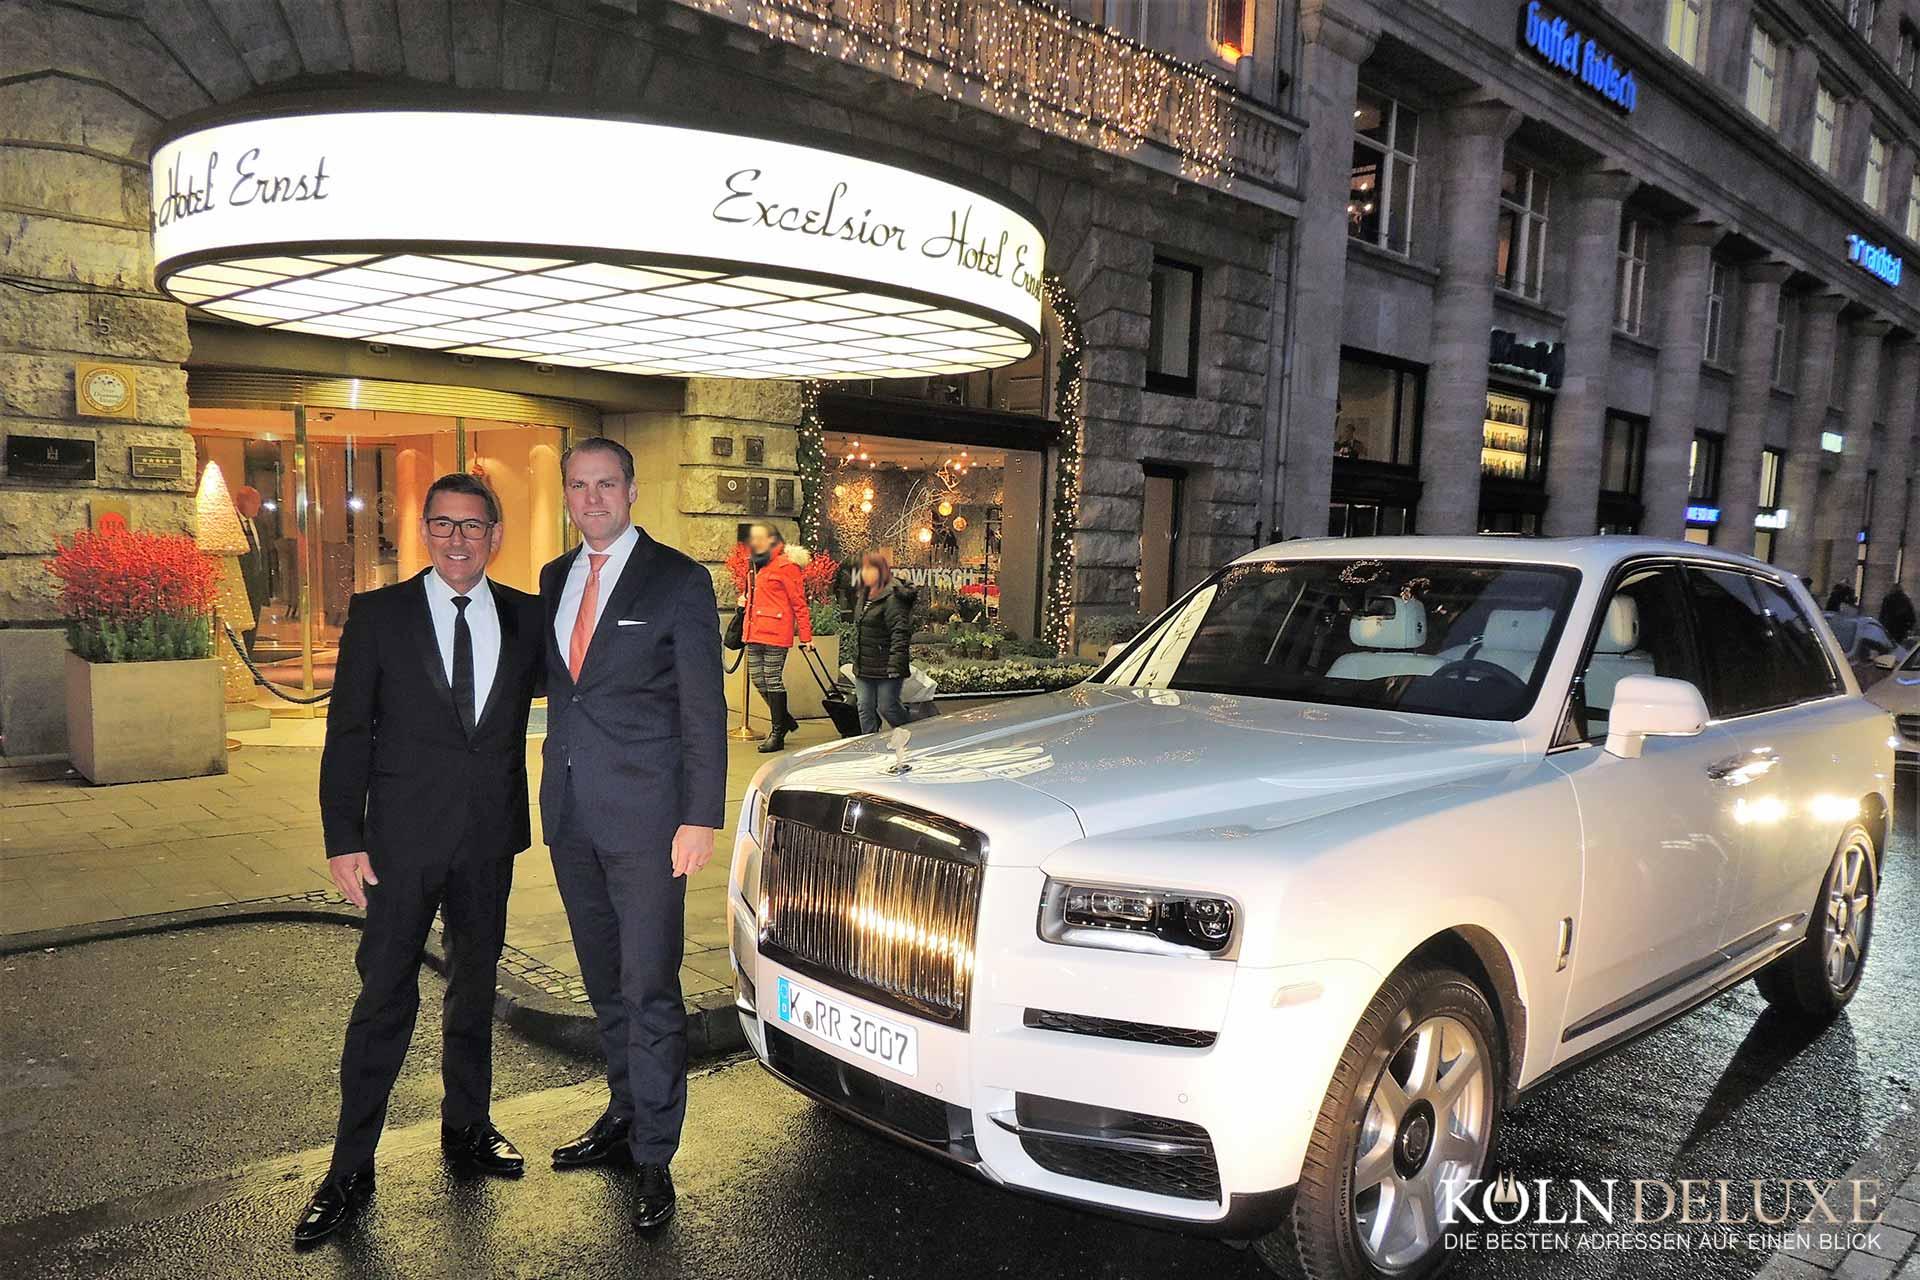 Rolls-Royce Motor Cars Cologne Präsentation des neuen Rolls-Royce Cullinan im Excelsior Hotel Ernst Köln